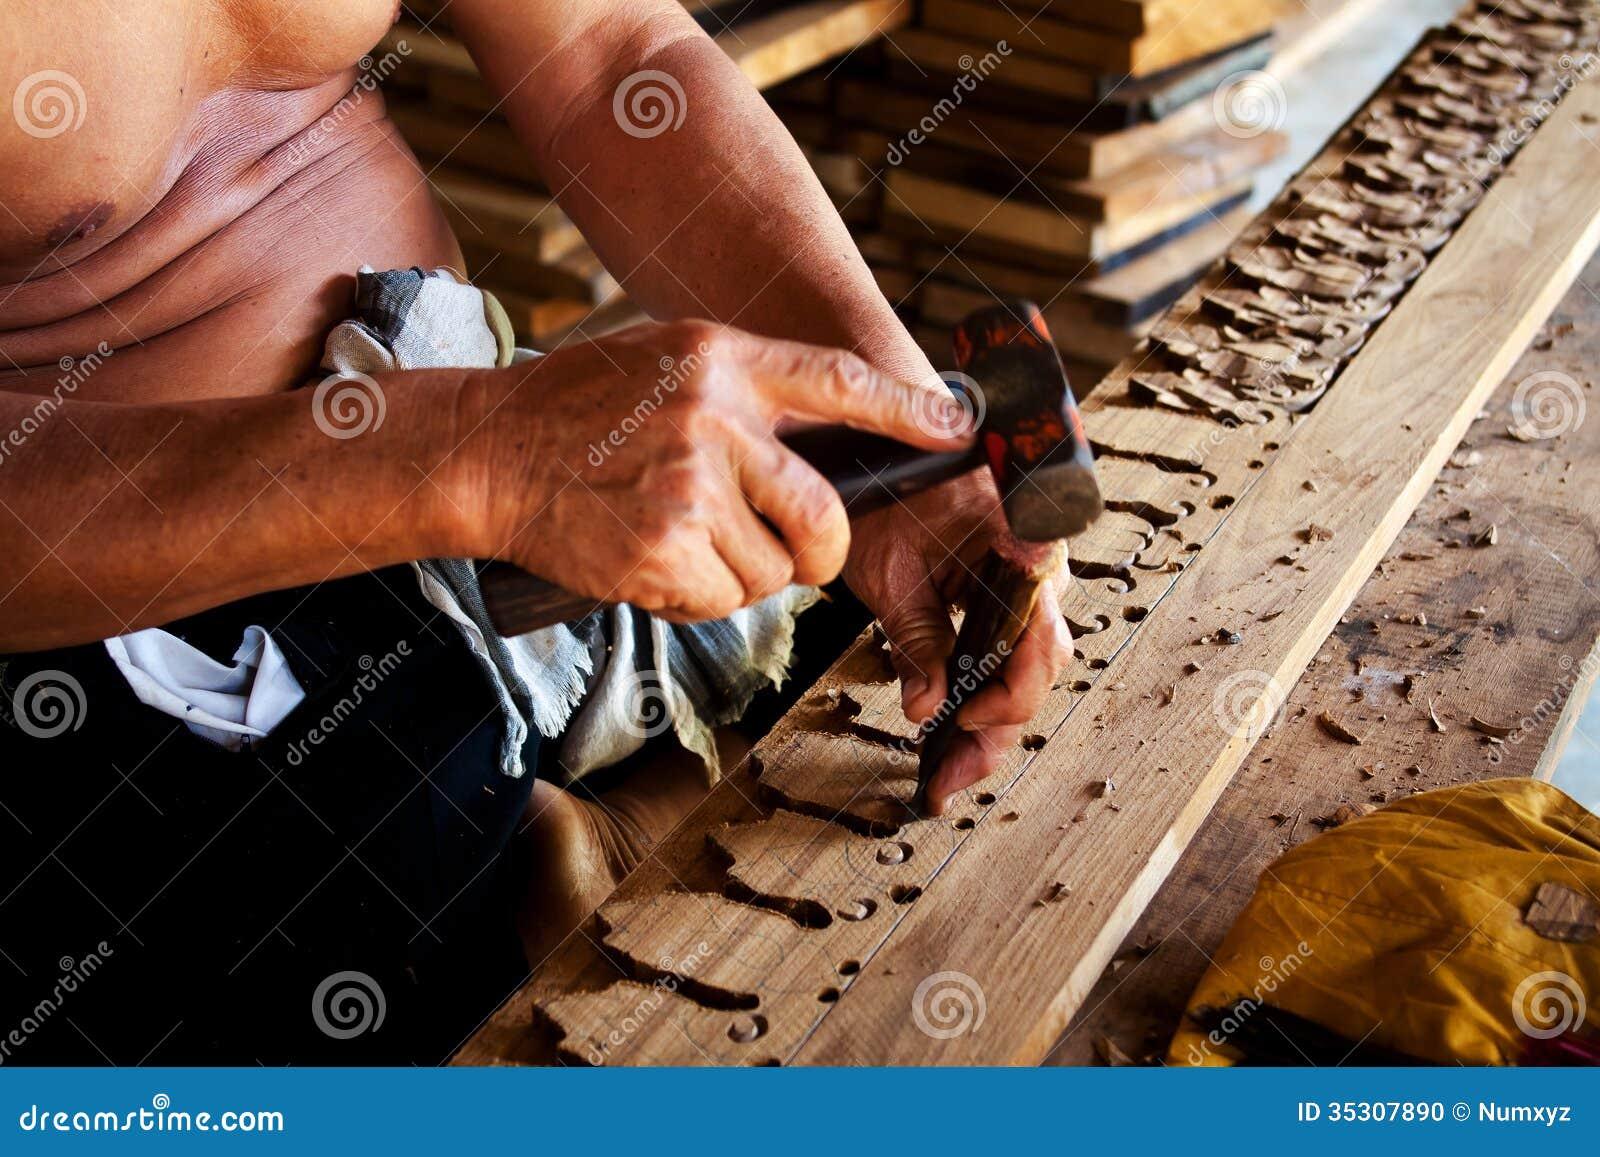 sculptor carving wood delicate beautiful 35307890 jpg